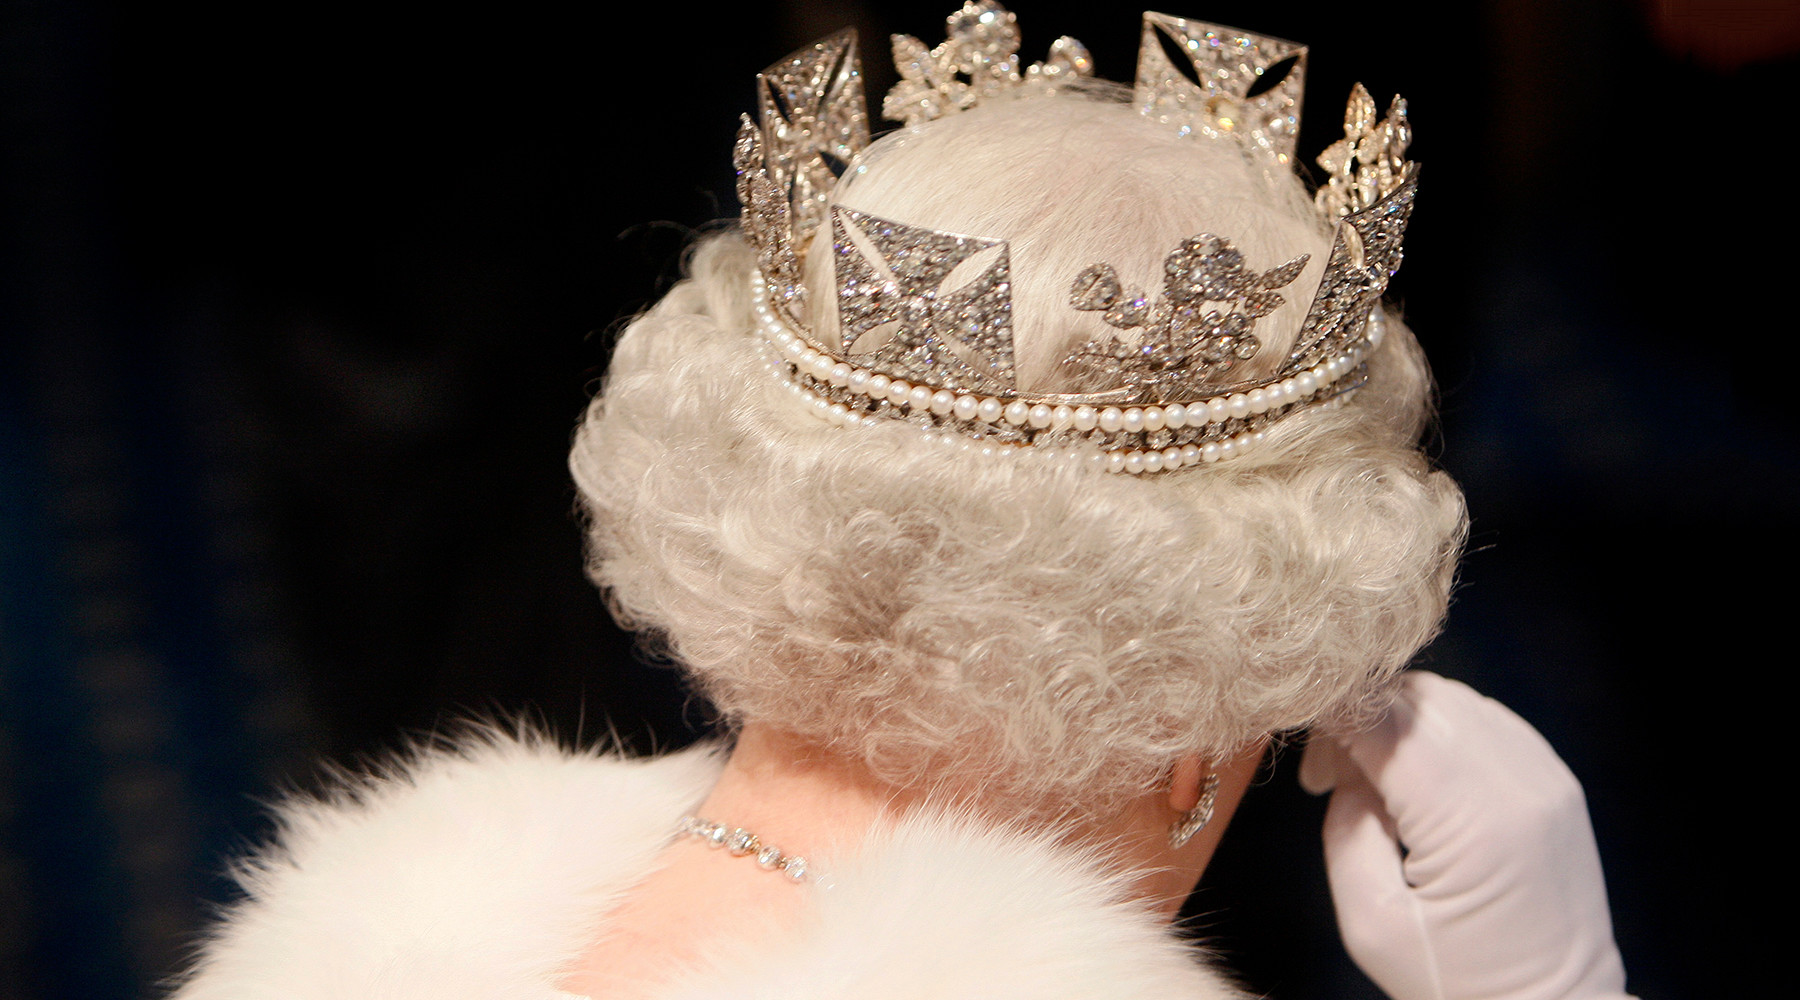 монархия или республика?